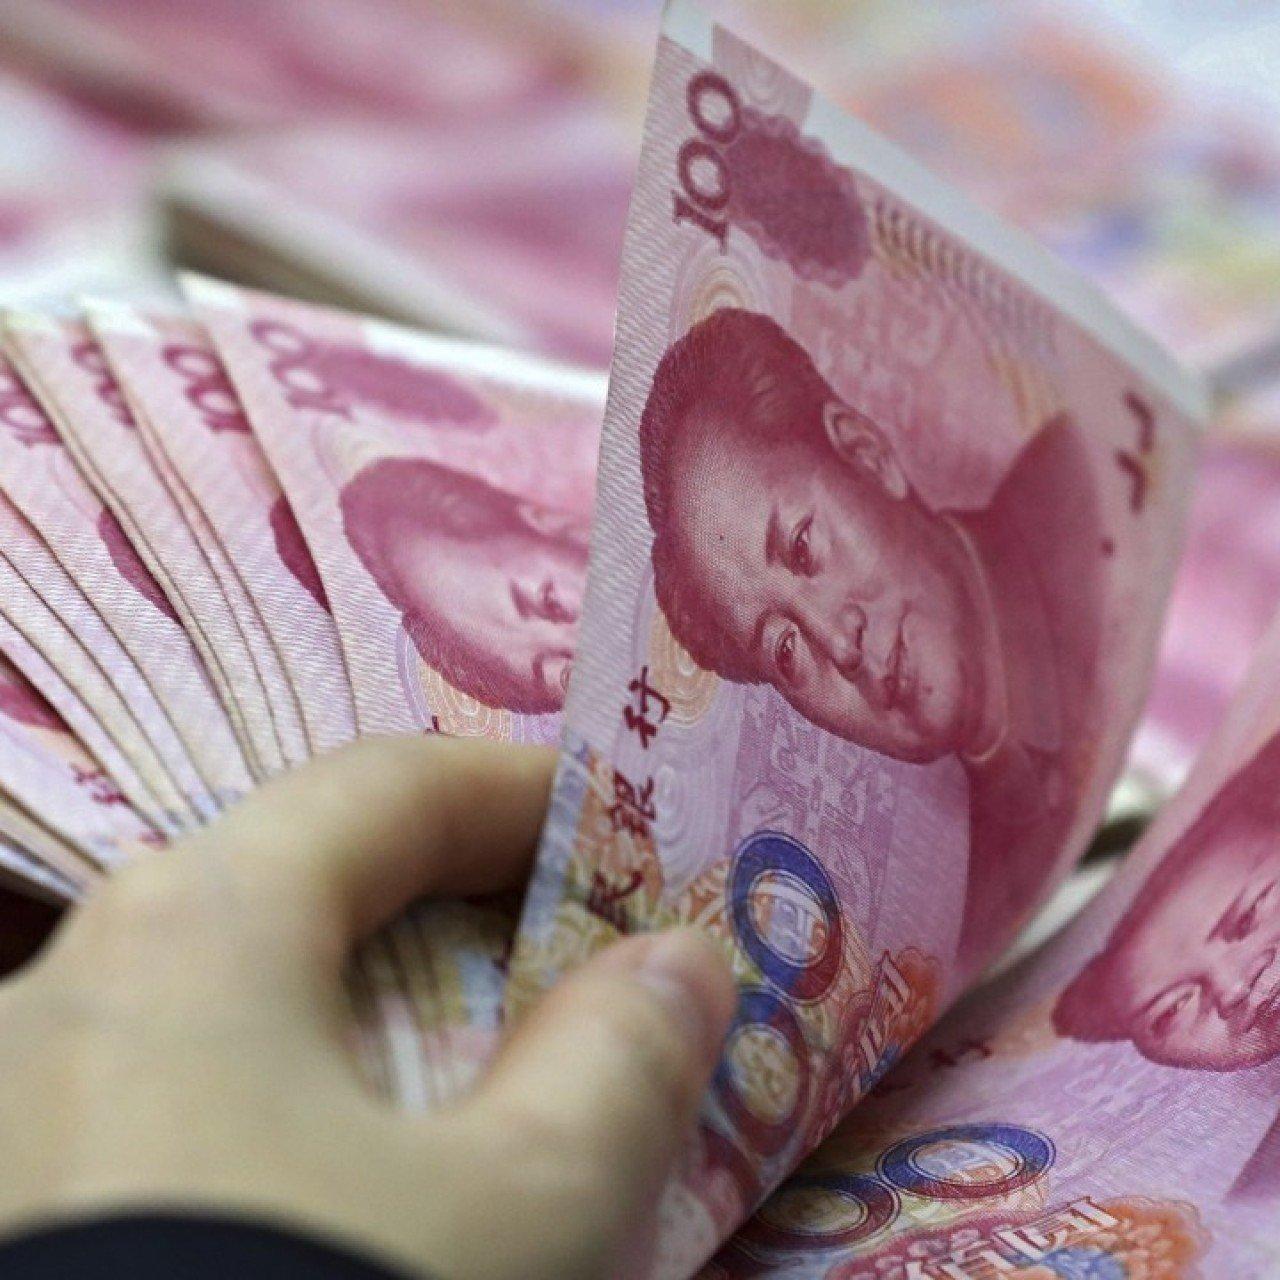 China's Premier Li Keqiang says loans to small firms should